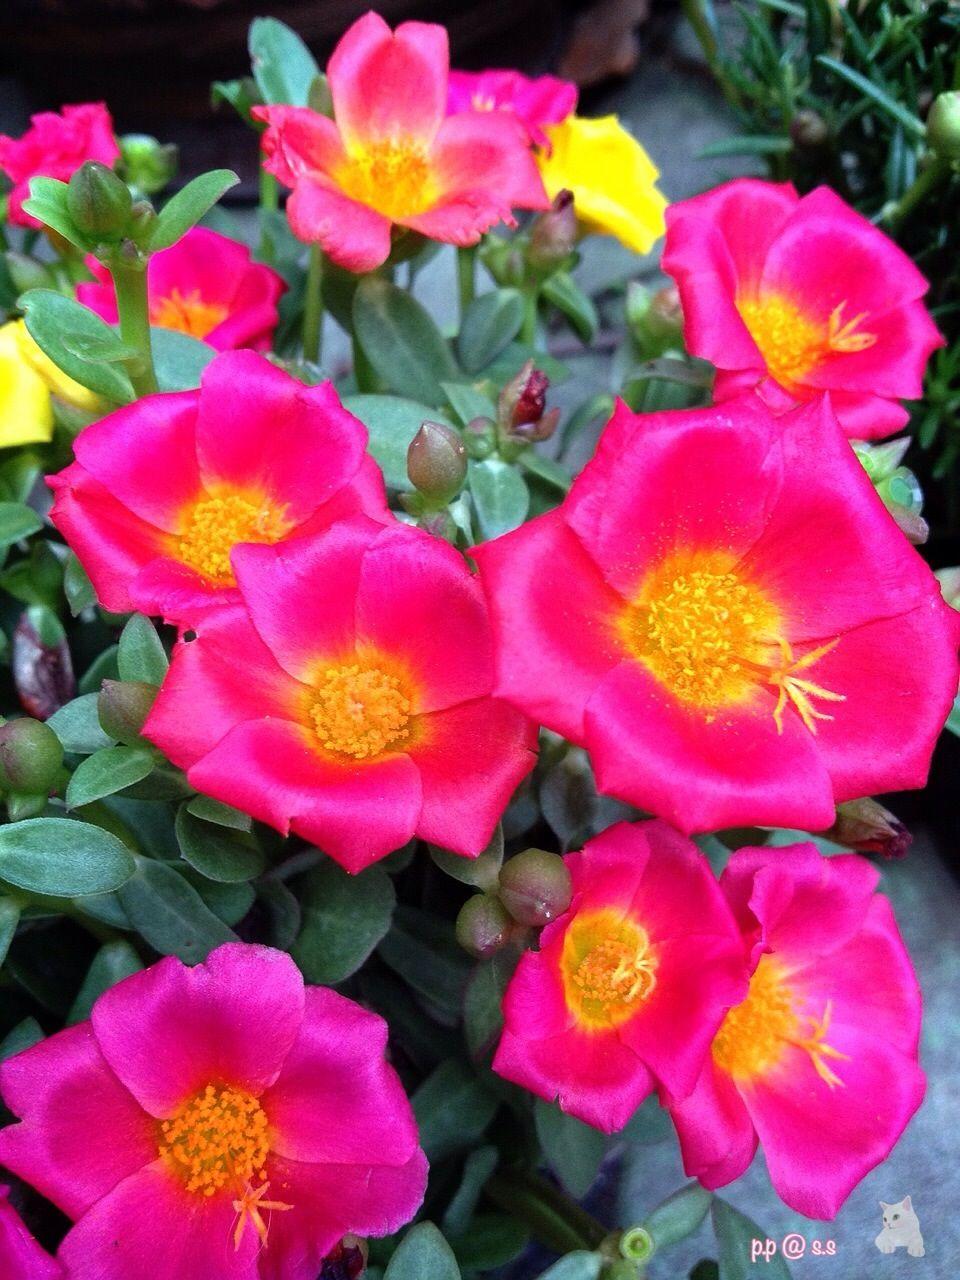 Shocking Pink Flower The Garden And Plants Flower Florist